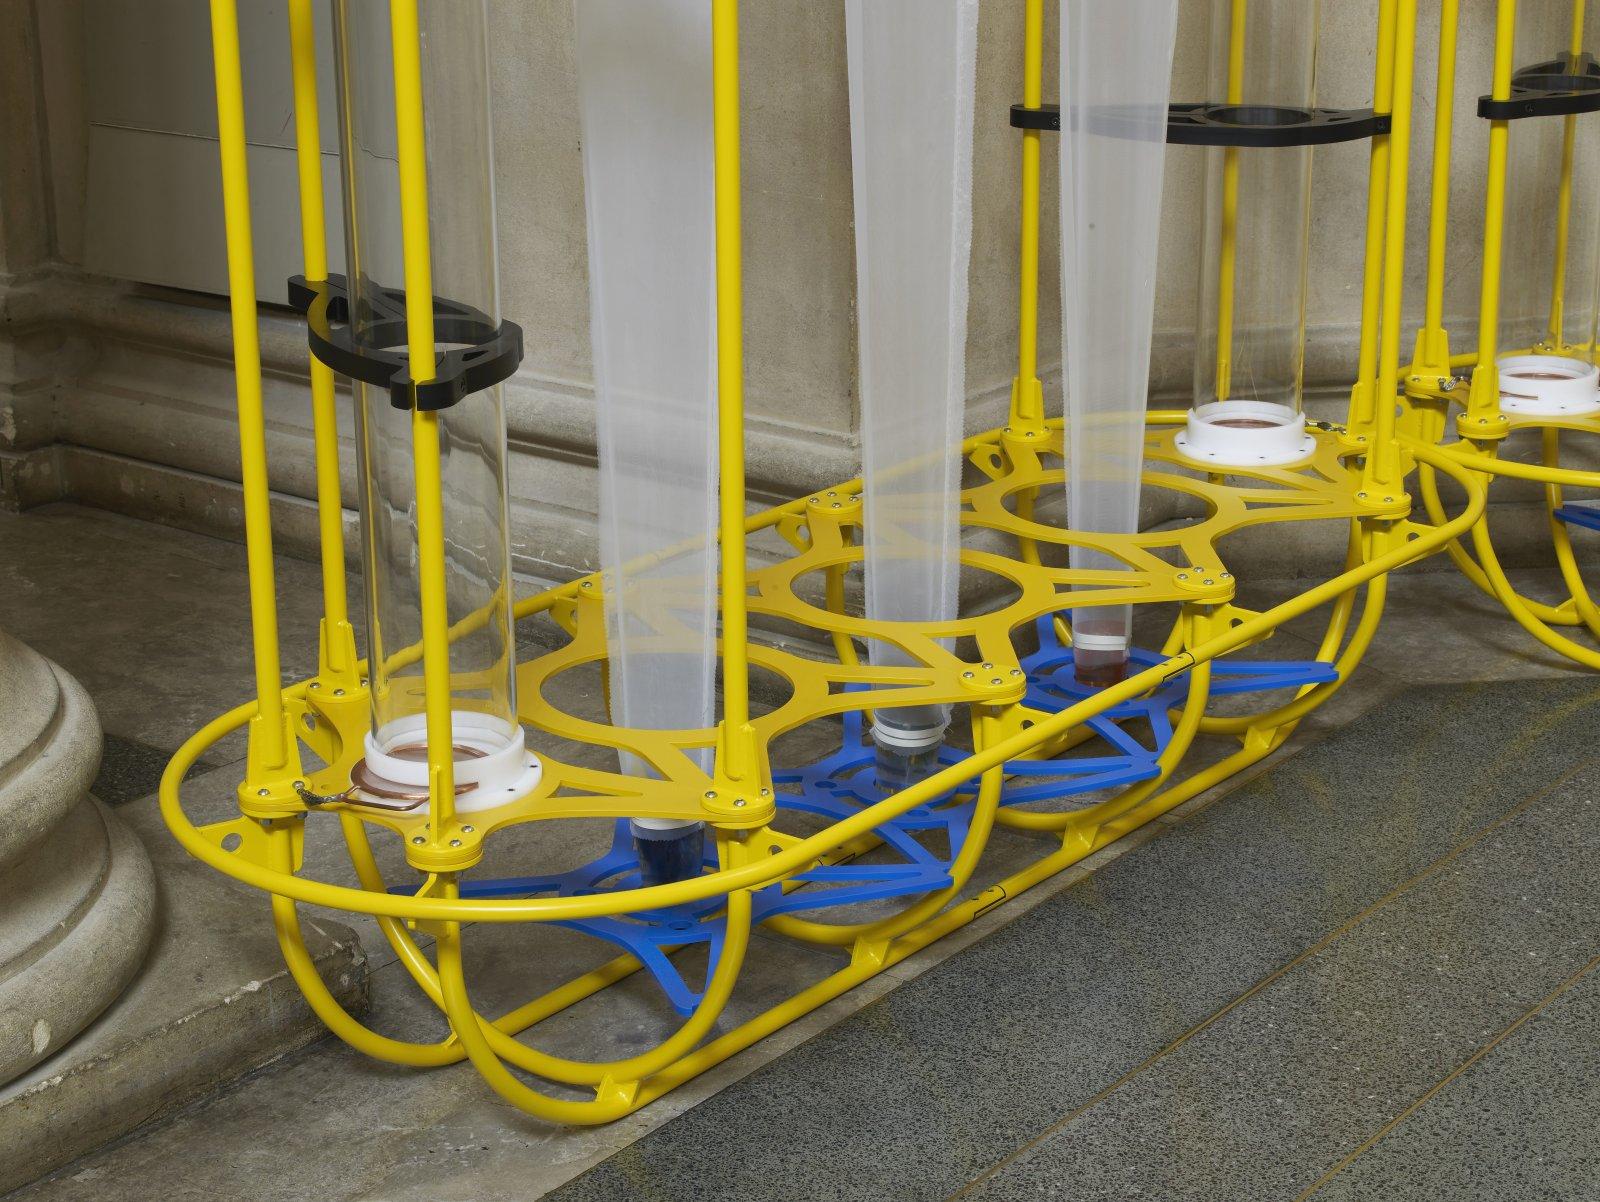 Christina Mackie, The Yellow Machines (detail), 2015, steel, aluminum, acrylic, styrene, copper, stainless steel, nylon webbing, polyethylene, nylon, resin, rubber, 128 x 160 x 32 in. (326 x 406 x 80 cm) by Christina Mackie